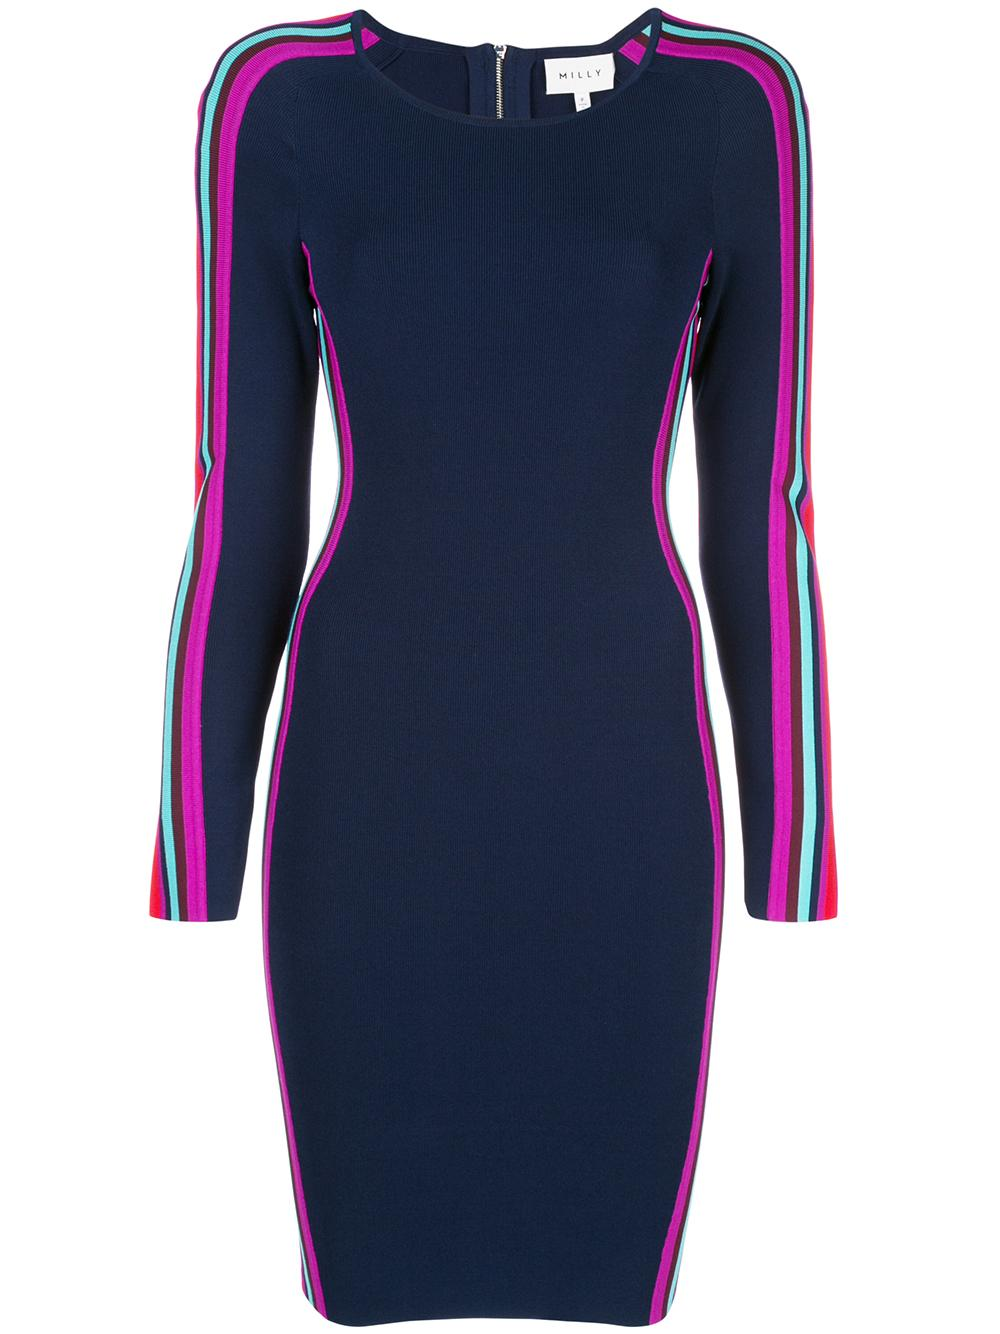 Racer Stripe Fitted Knit Dress Item # 223JK120366